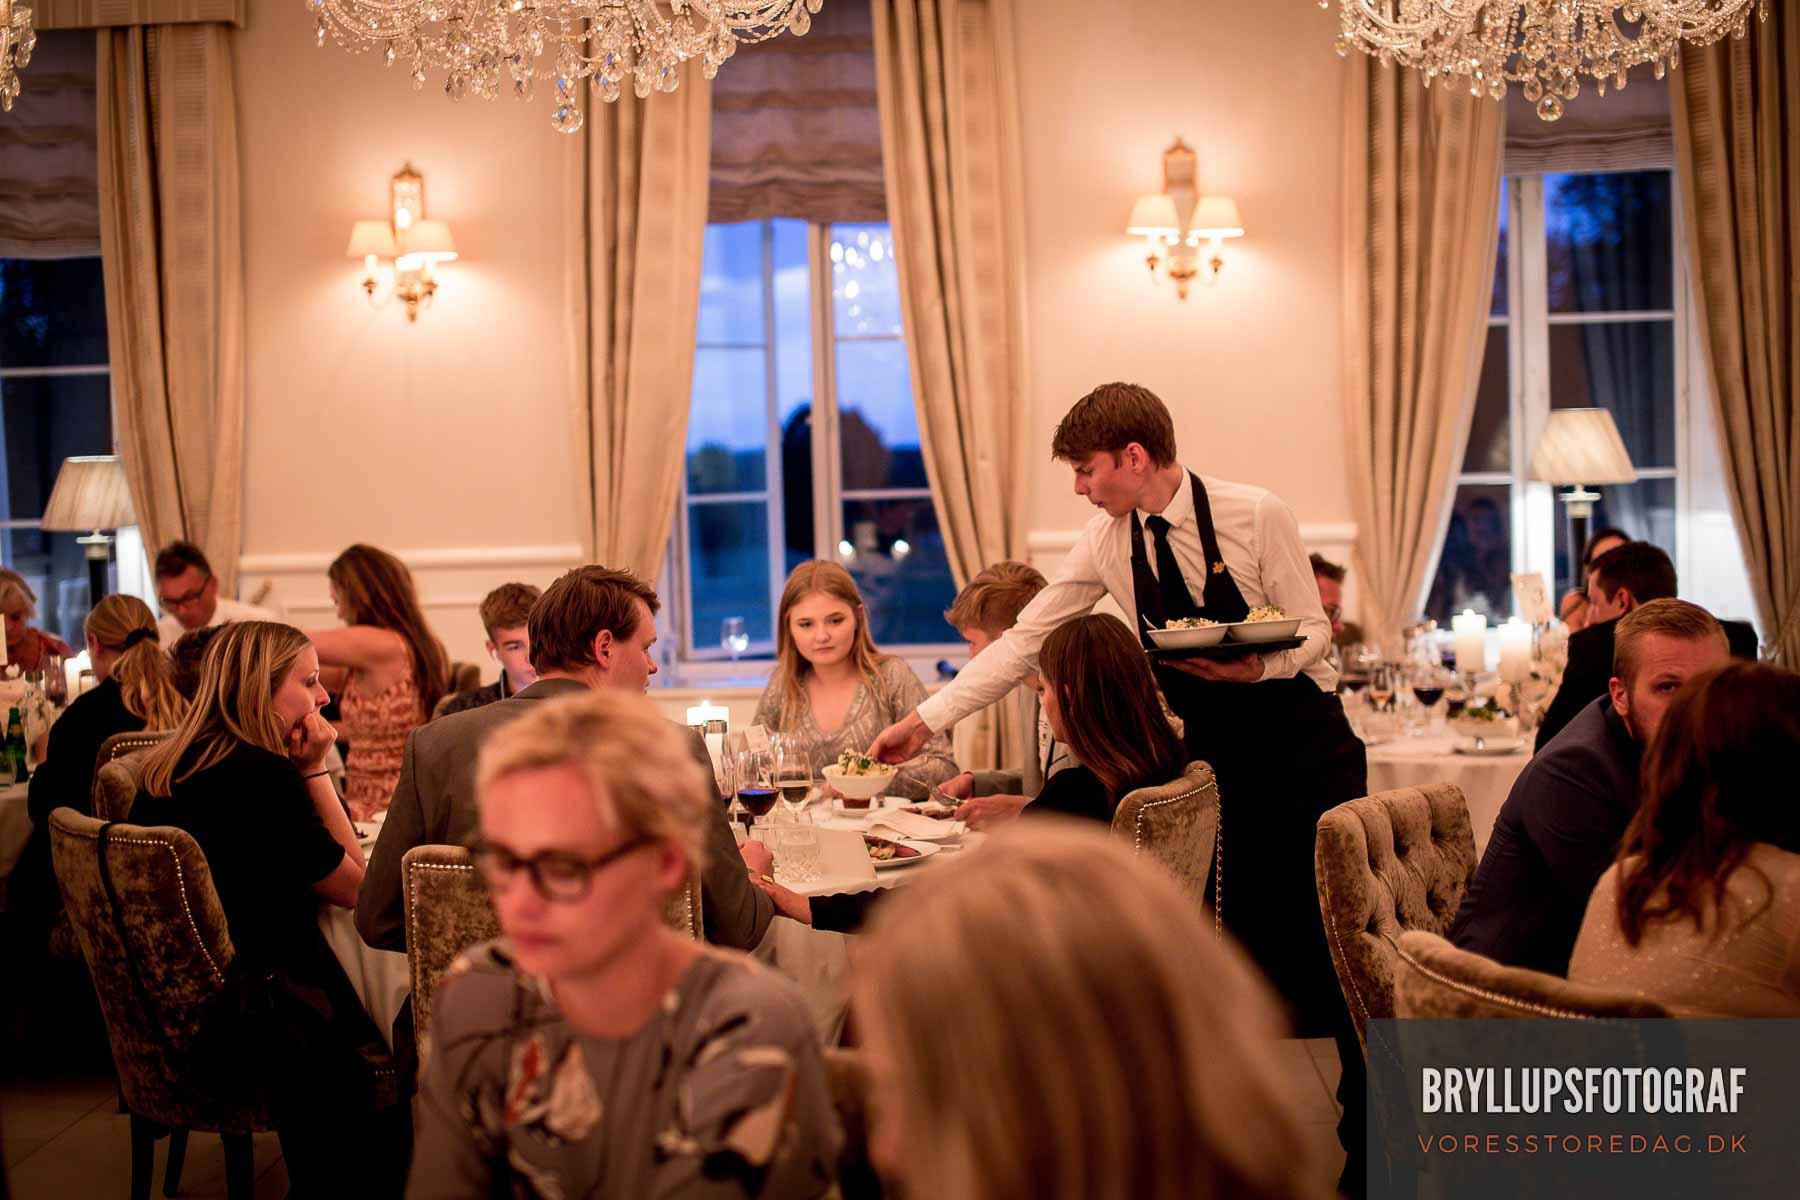 Fest fotograf/video - bryllup - sølvbryllup - konfirmation - fødselsdag